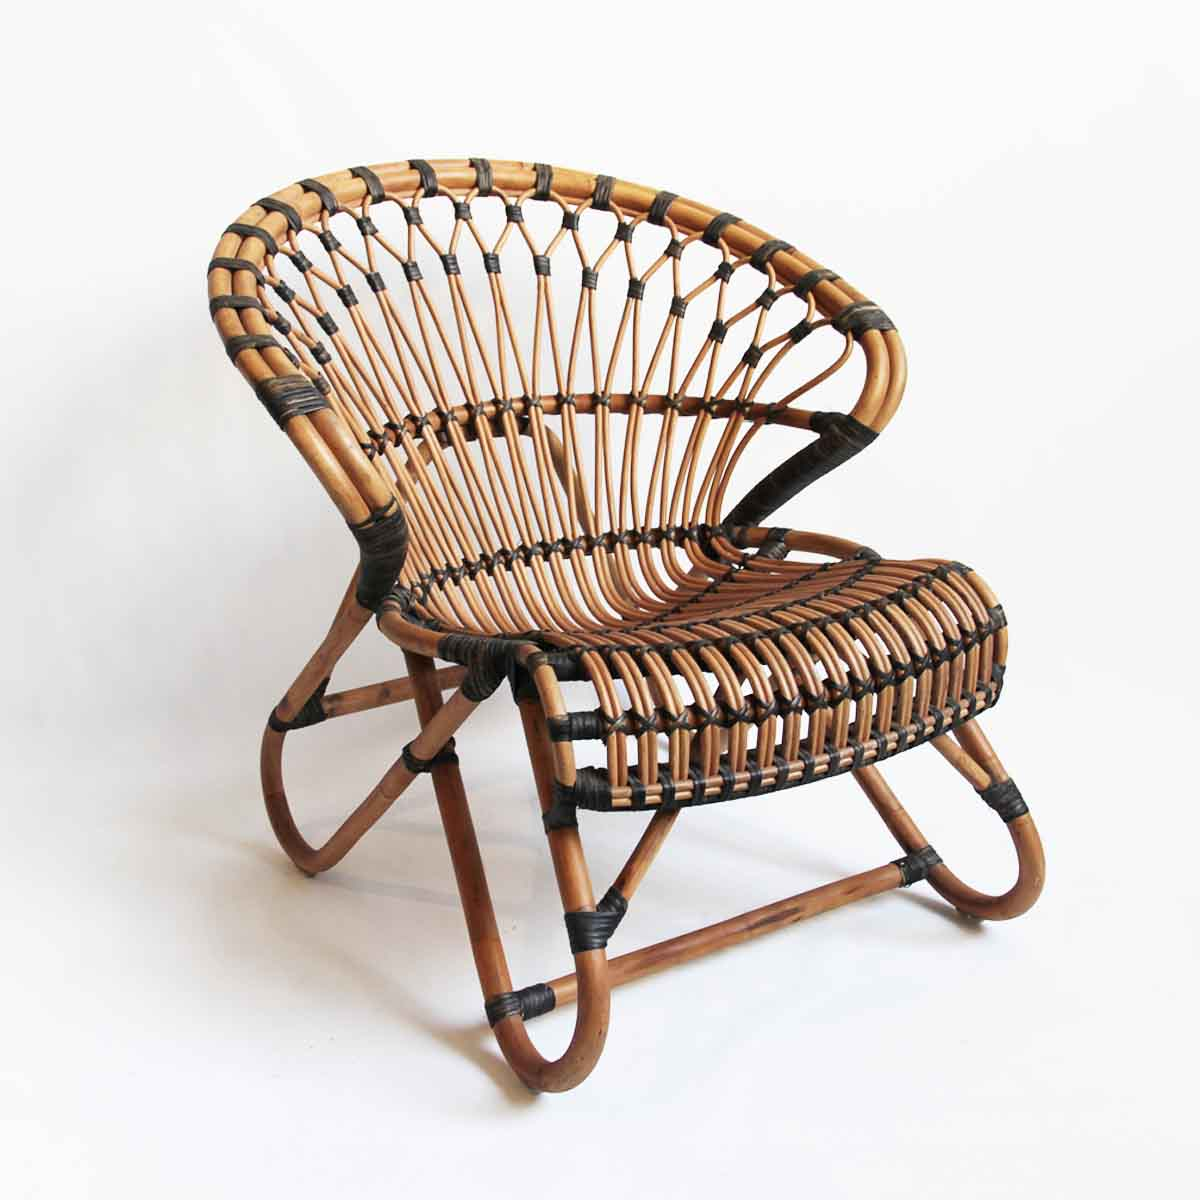 bamboo rattan chairs. $880.00 Bamboo Rattan Chairs P